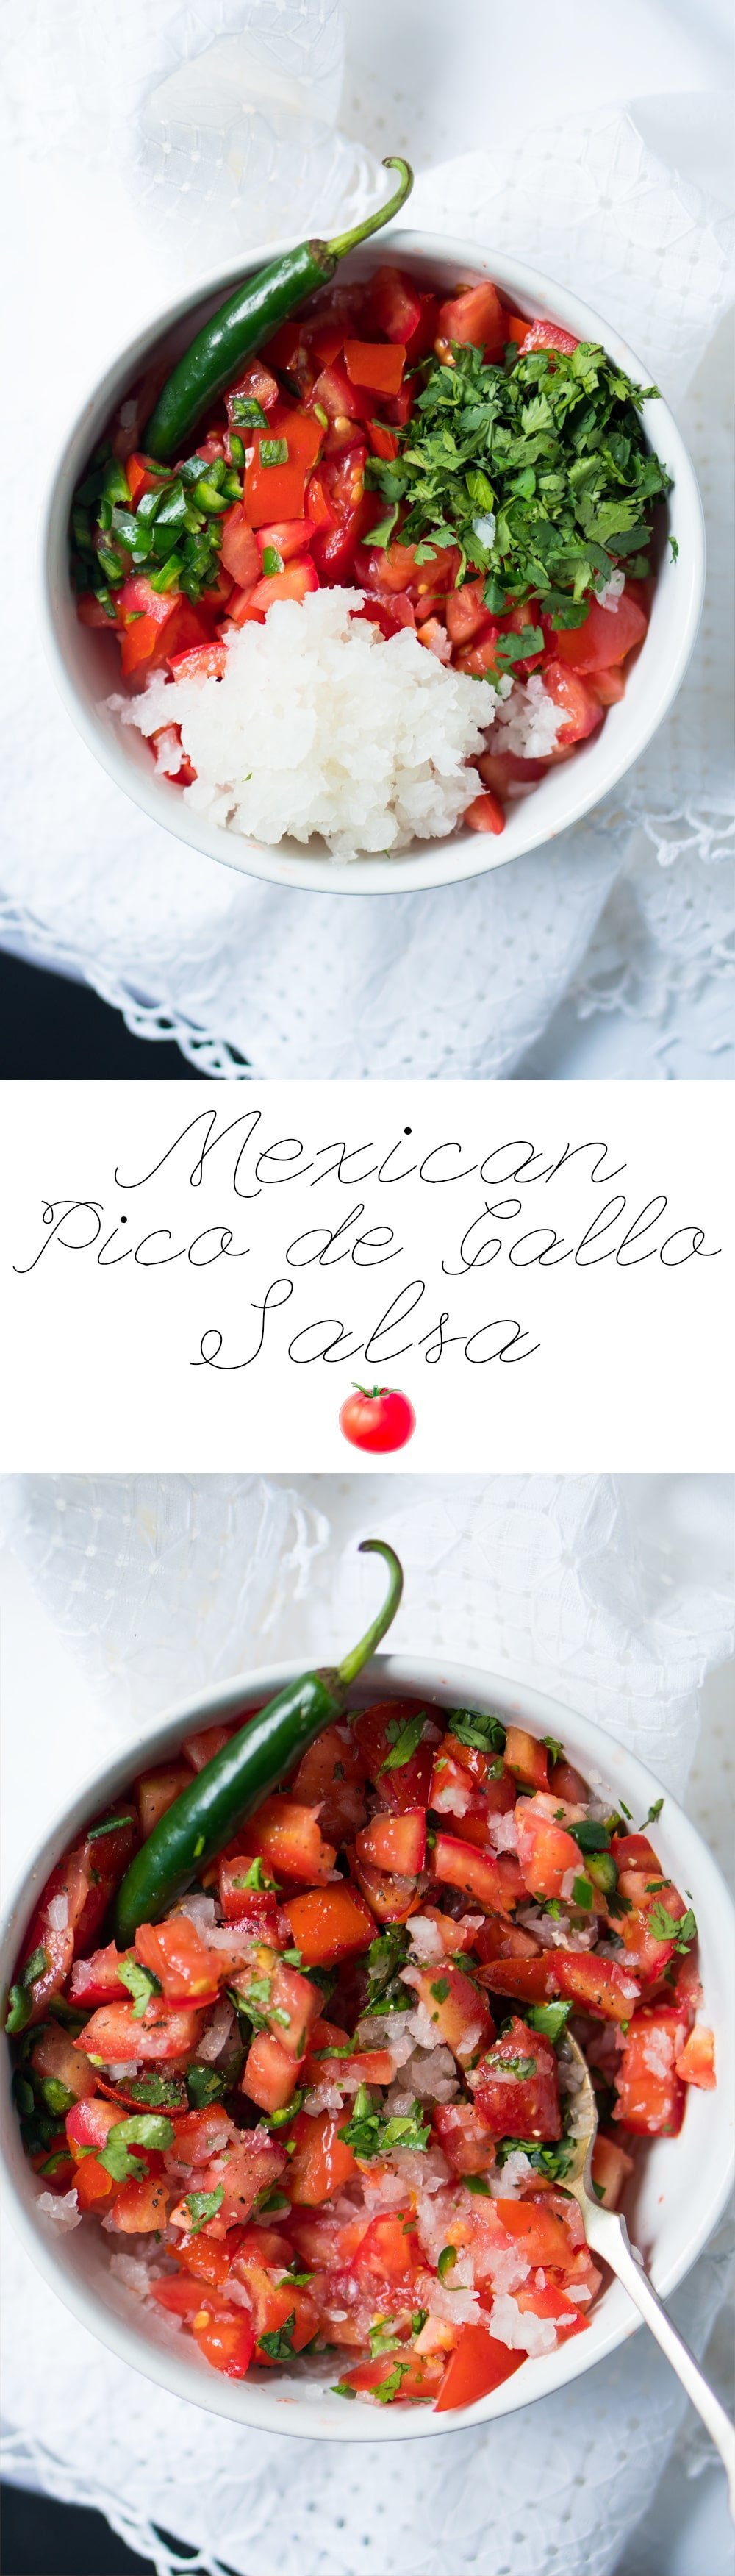 Ultra Mexican Pico de Gallo Salsa ? gluten free, keto & vegan